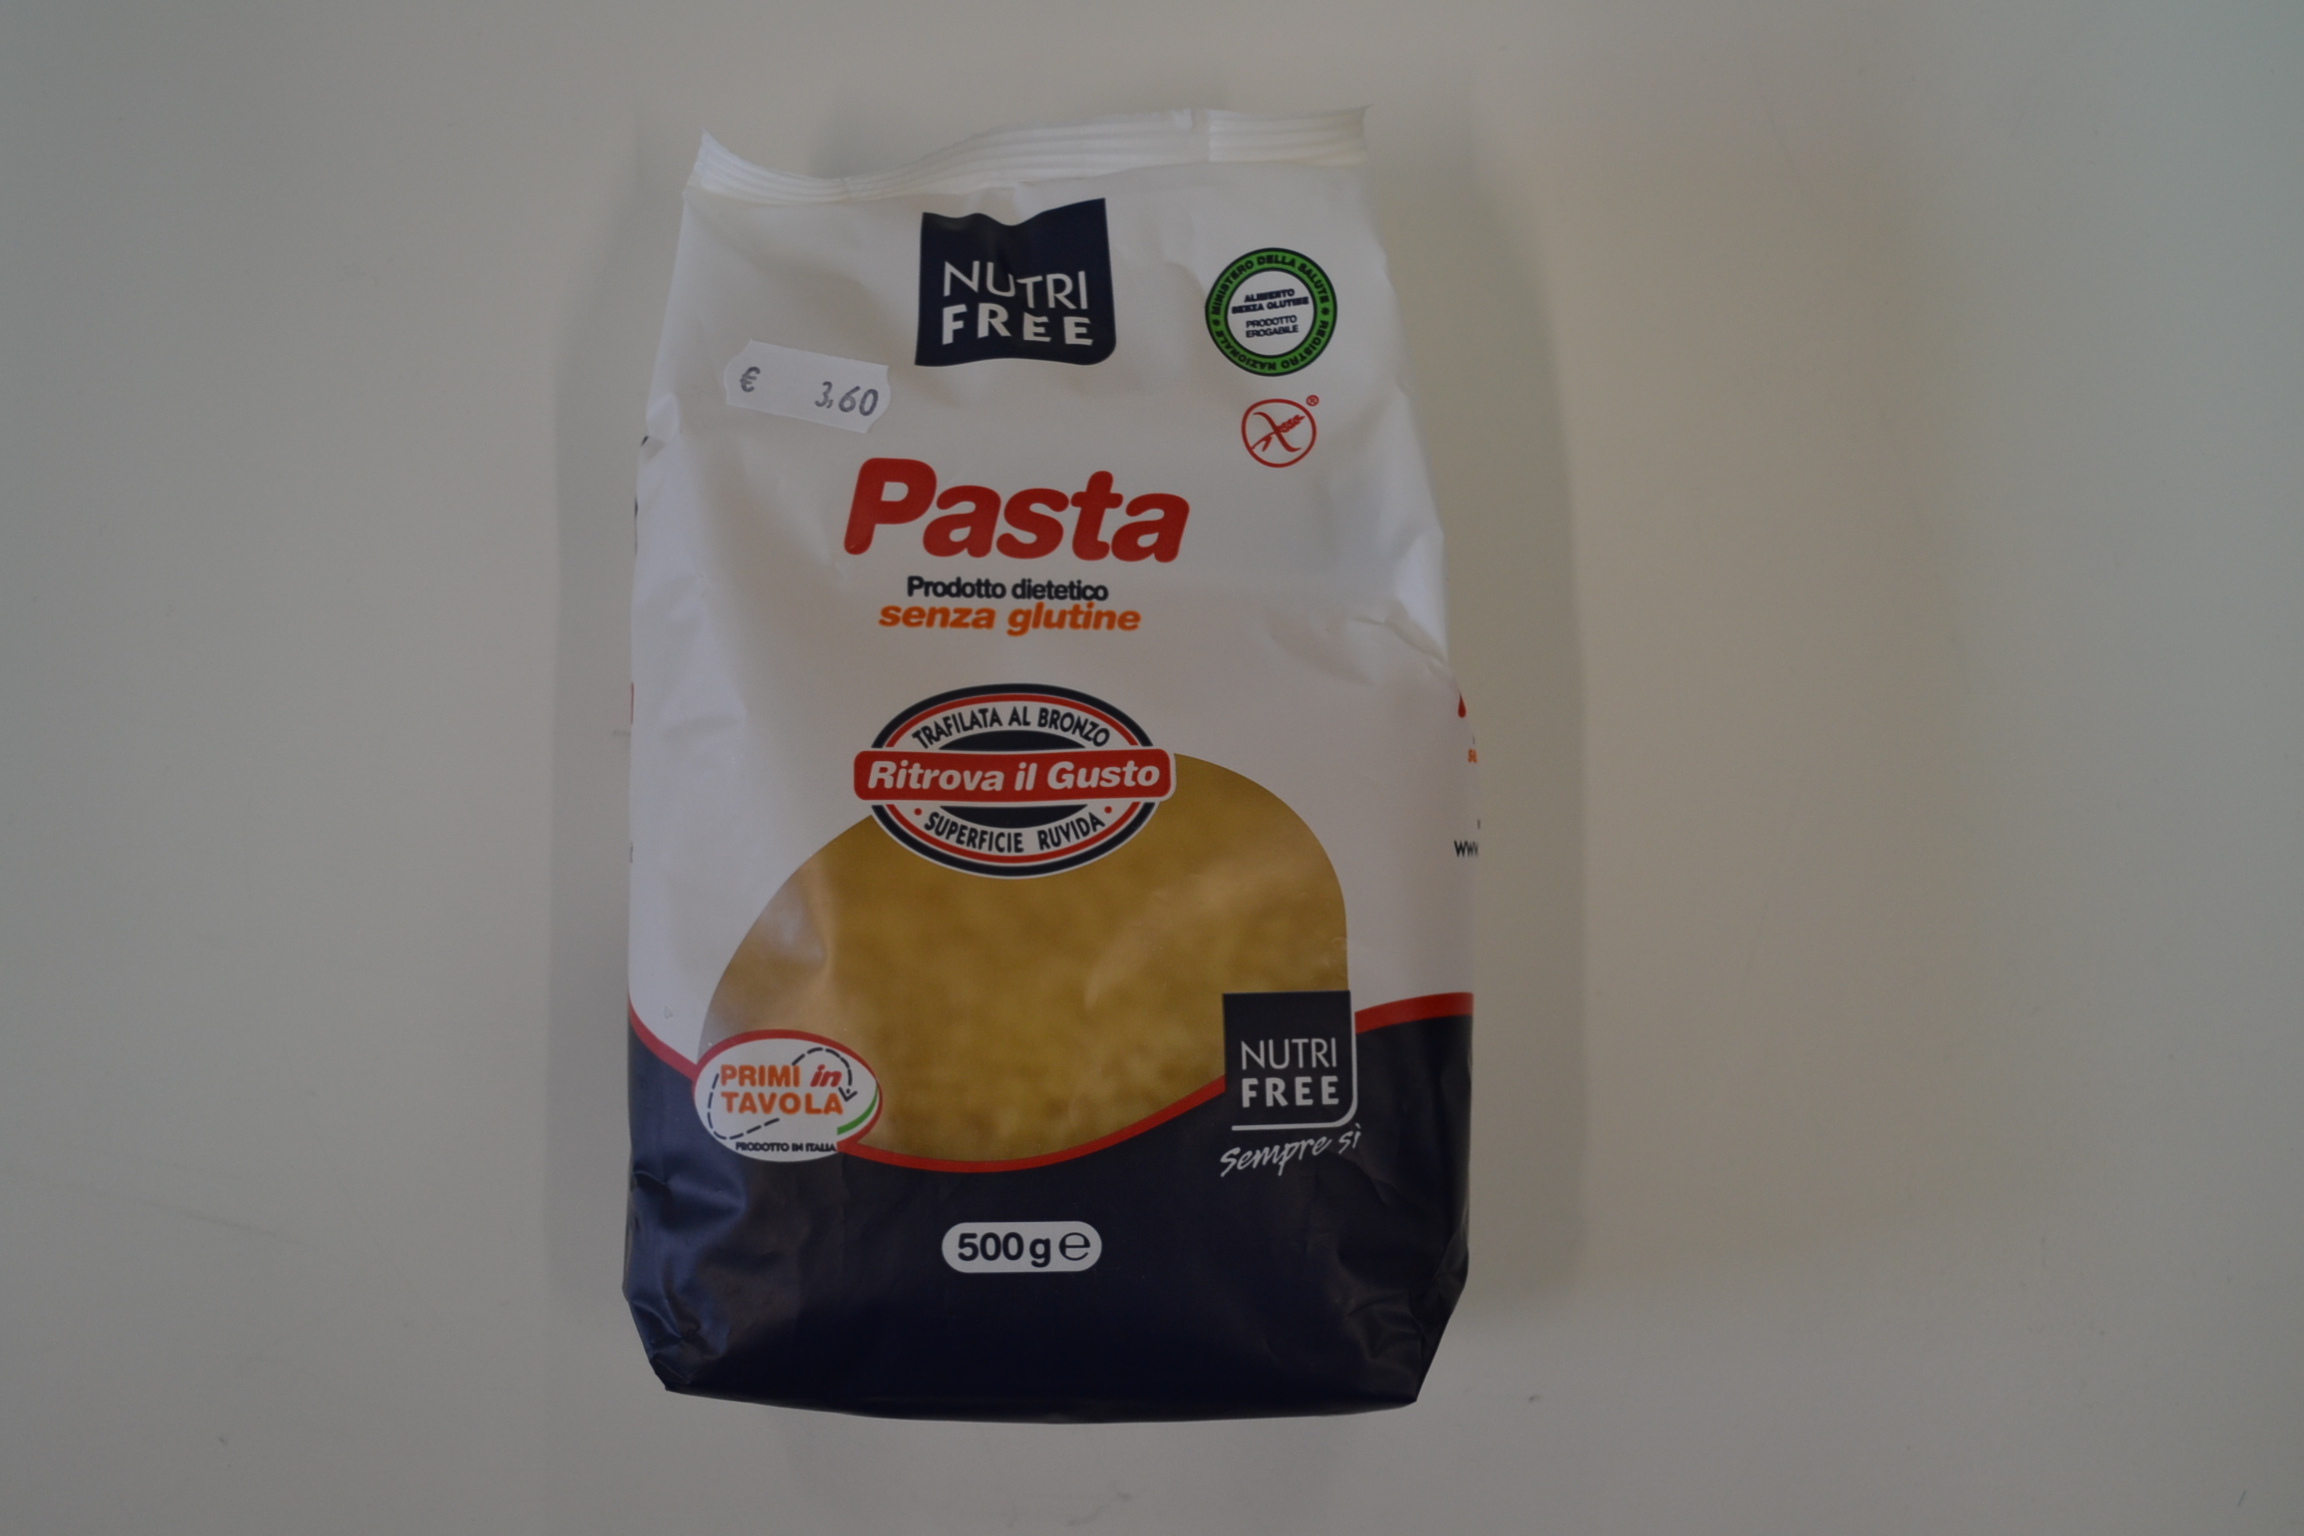 Pasta minestre NUTRI FREE € 3,60